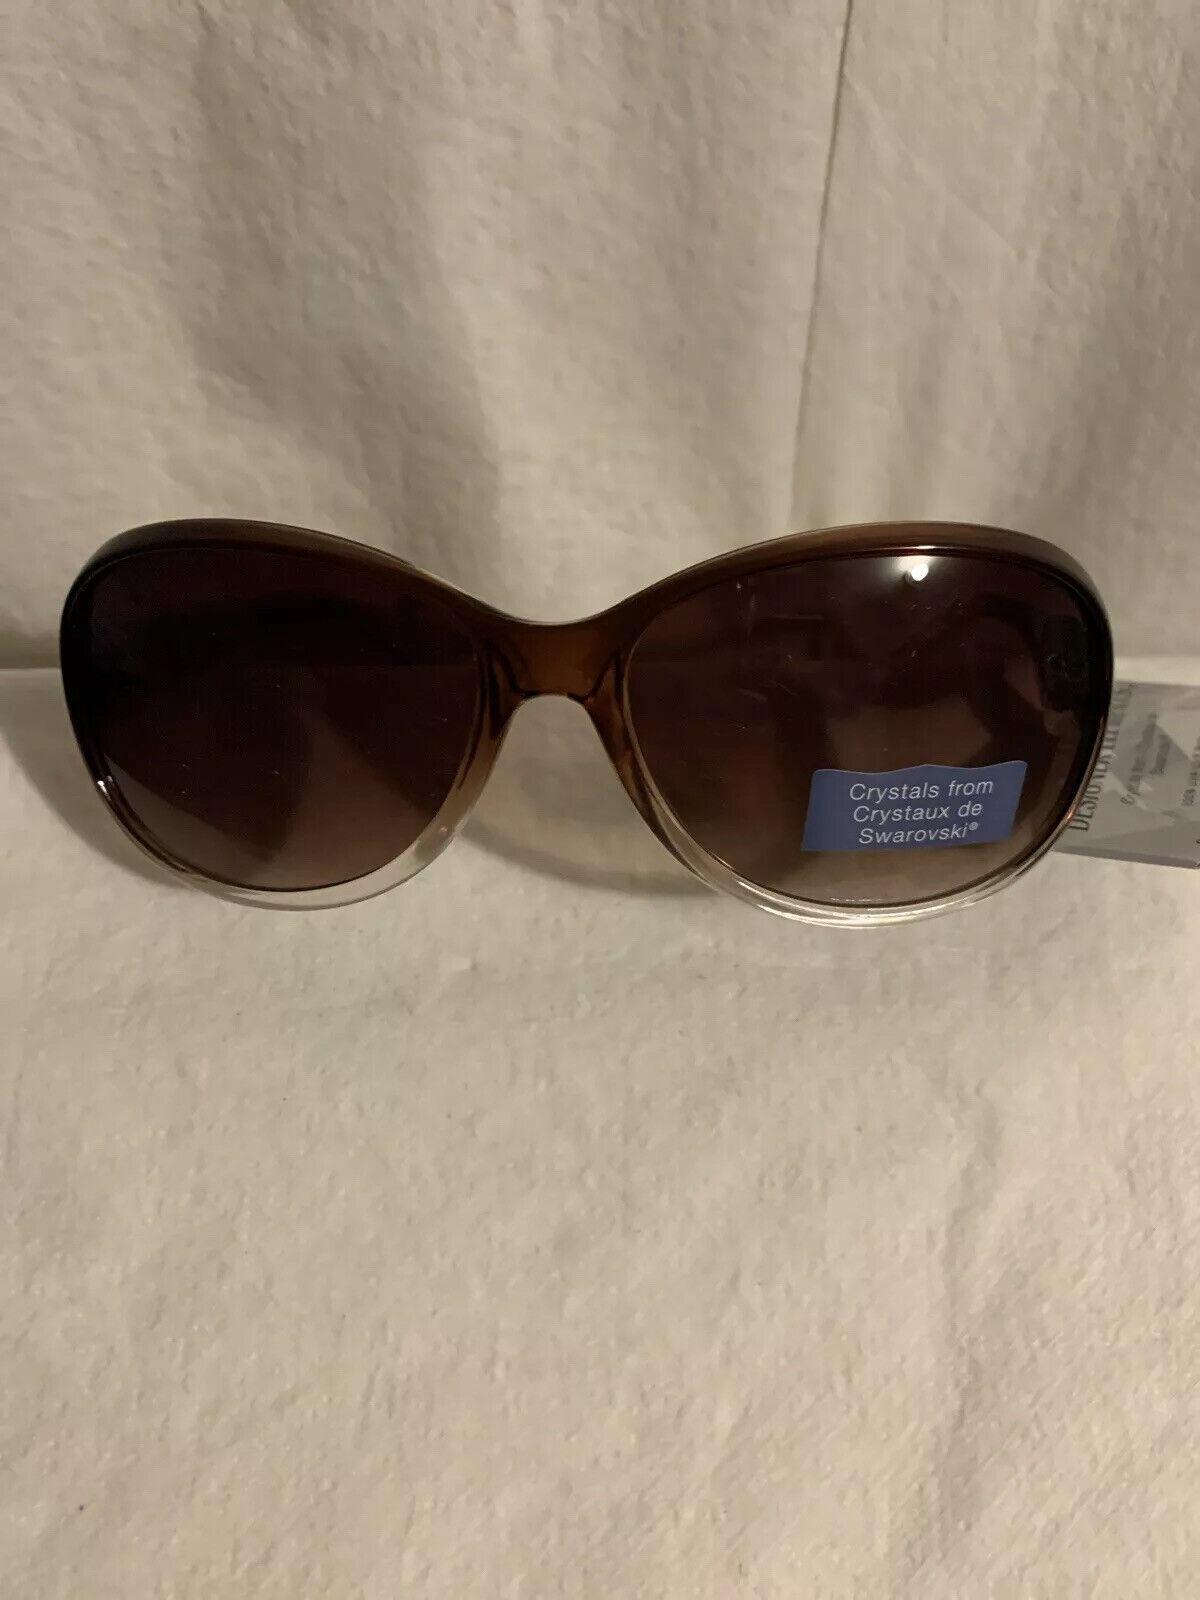 """dare 10223907""DESIGNER ELEMENTS Crystals Fr/Crytaux de Swarovski Sunglasses"